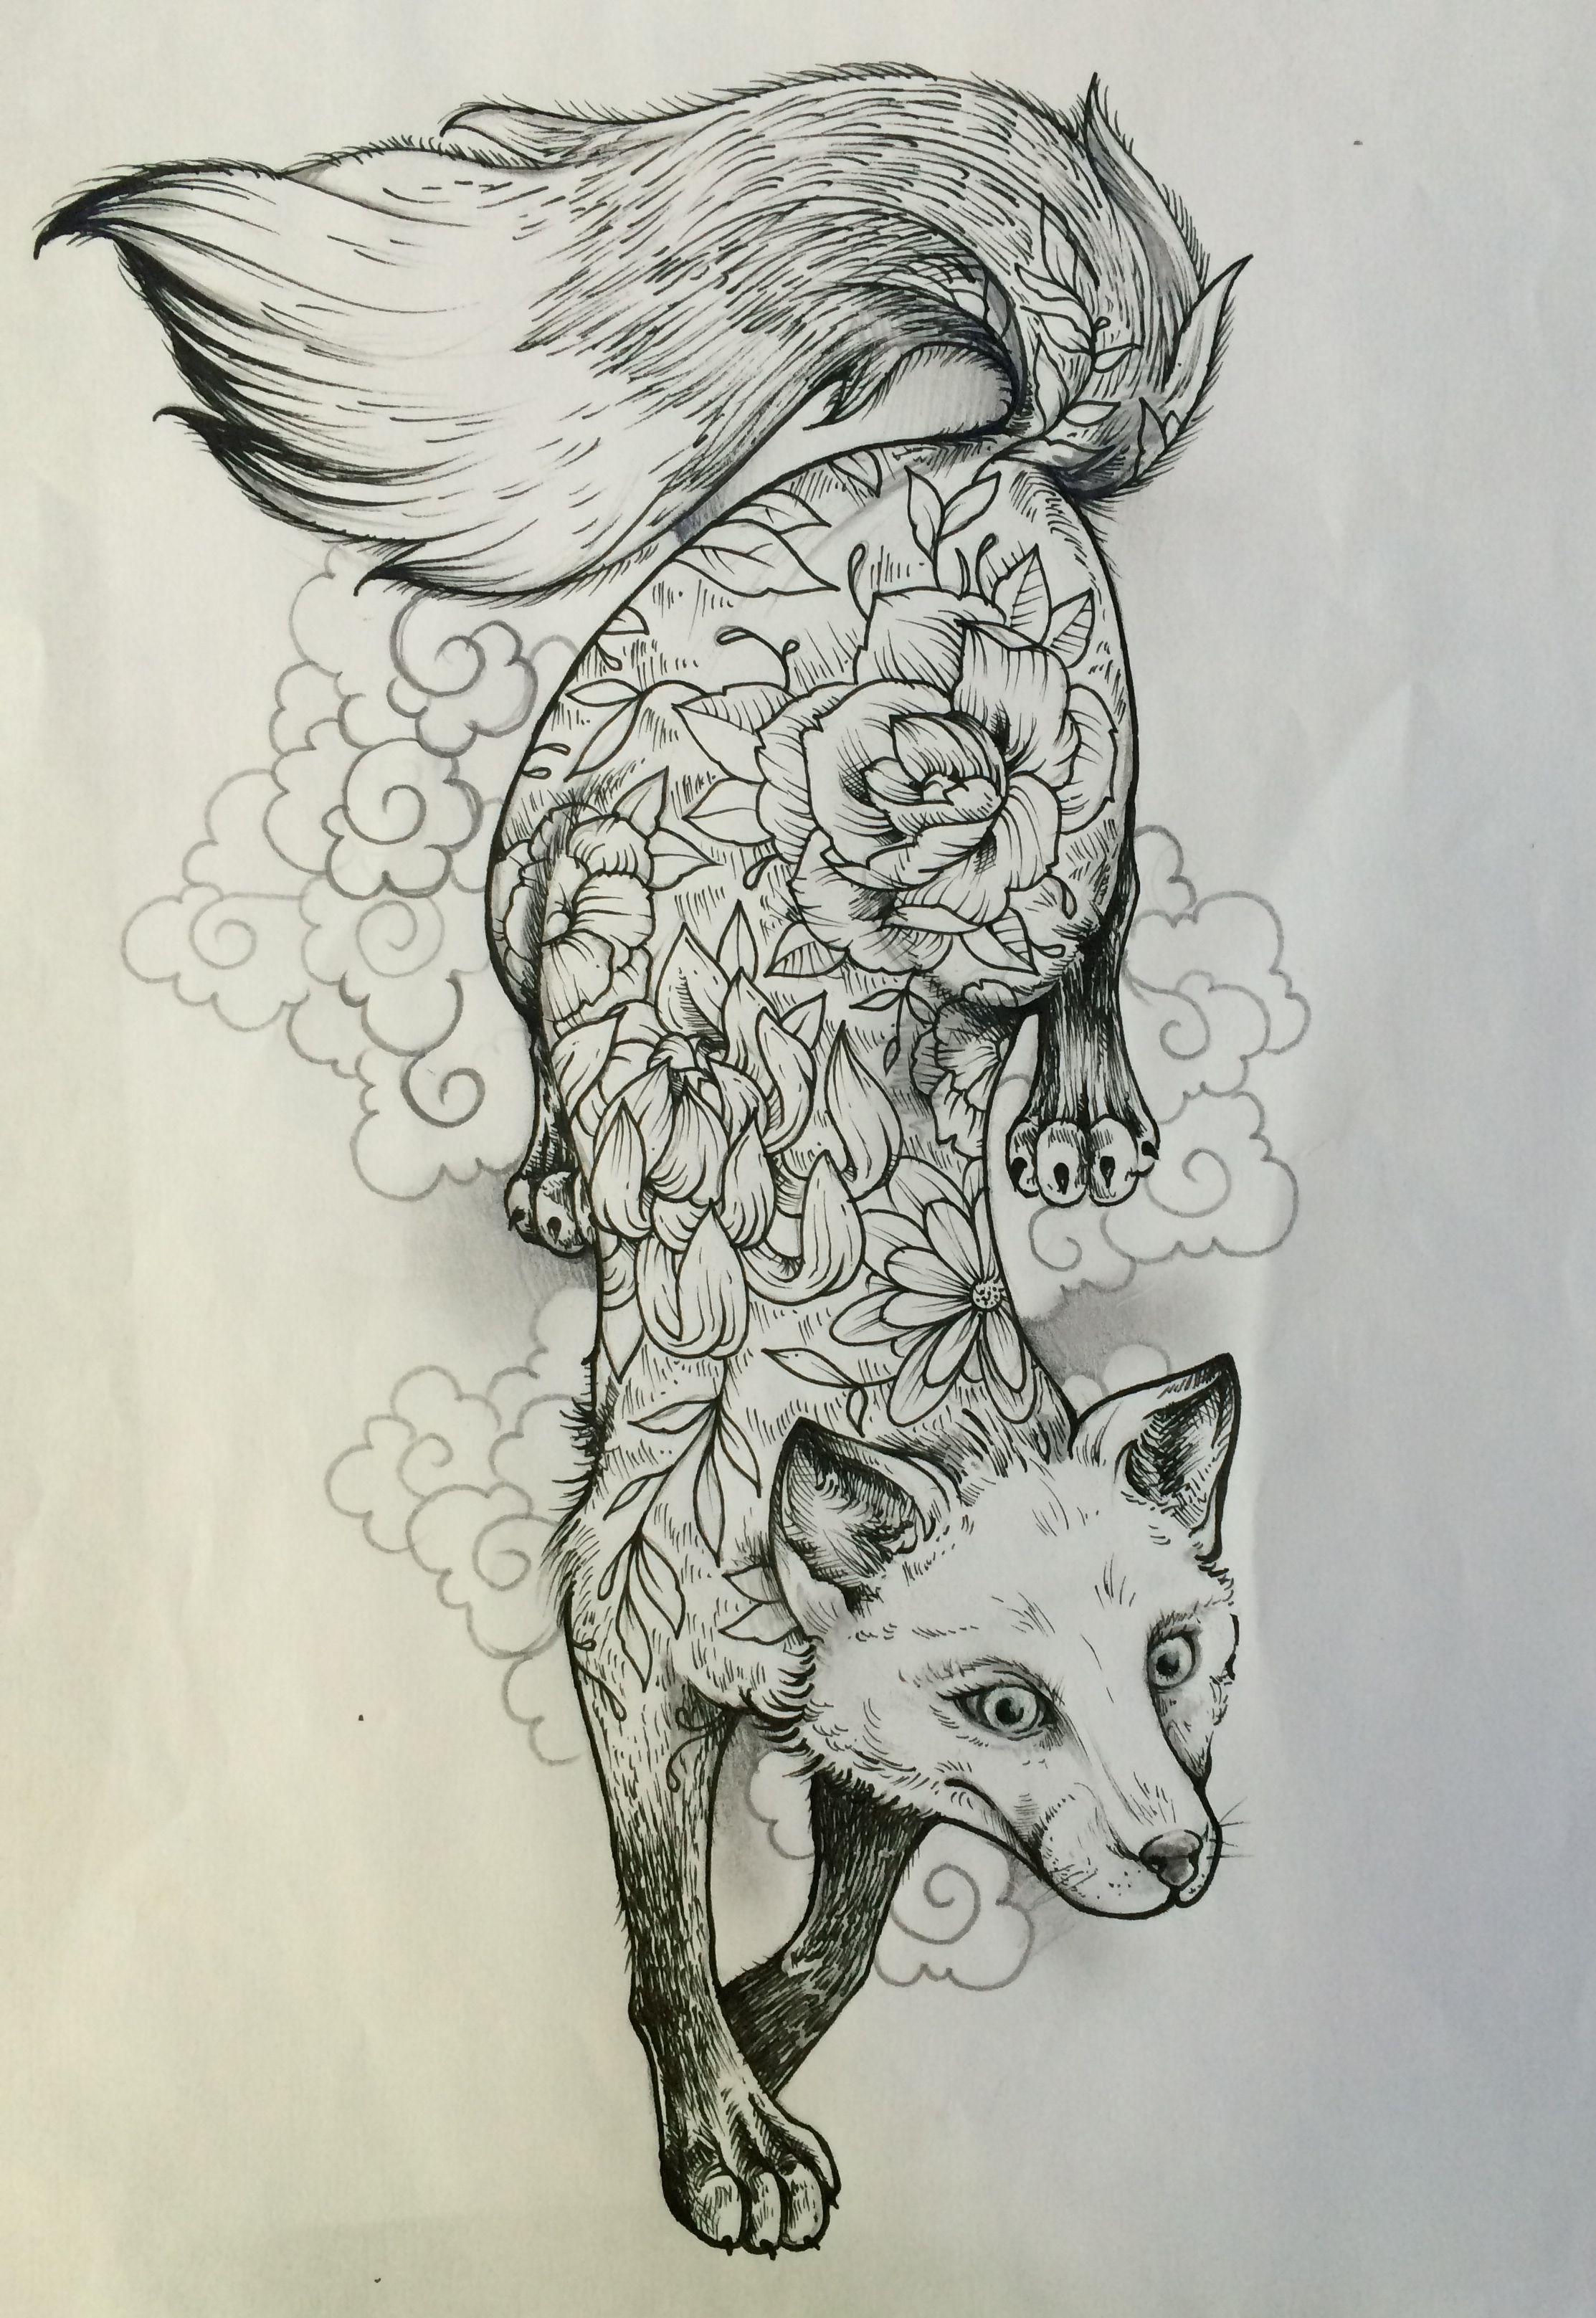 Dessin tatouage renard graphique art pinterest tatoo tattoo and drawing ideas - Dessin renard ...